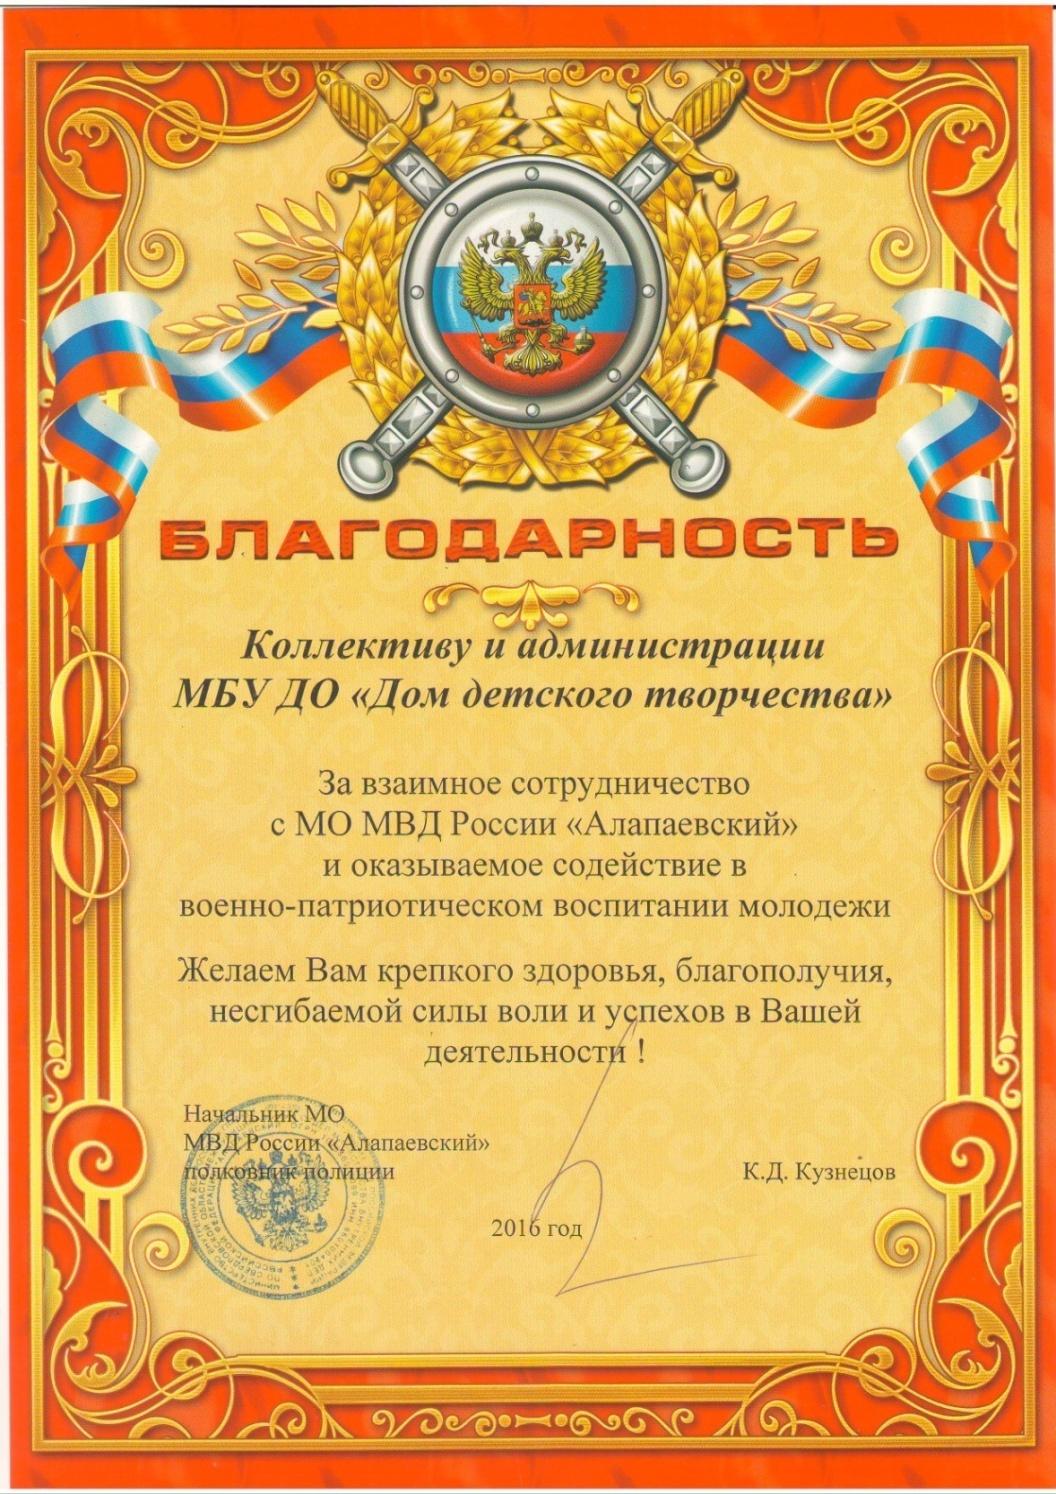 C:\Documents and Settings\Admin\Рабочий стол\фото-в МВД\благодарность.JPG